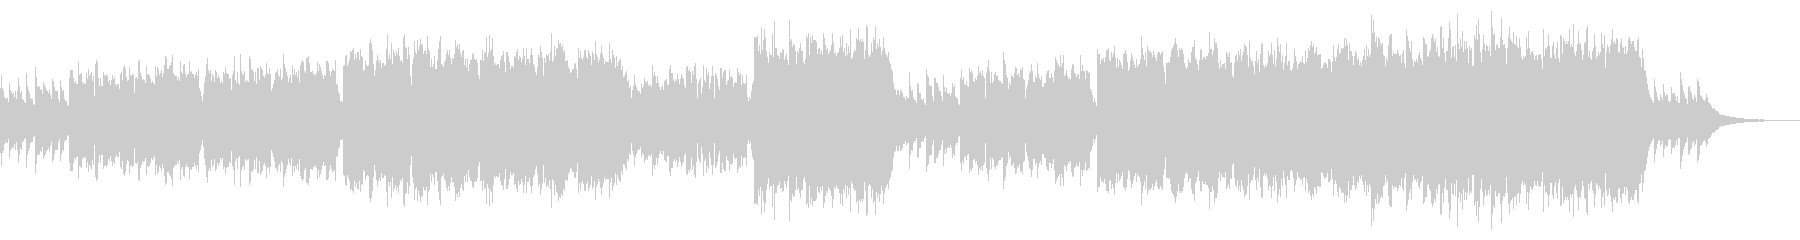 CMや映像に 透明感あるピアノとフルートの未再生の波形